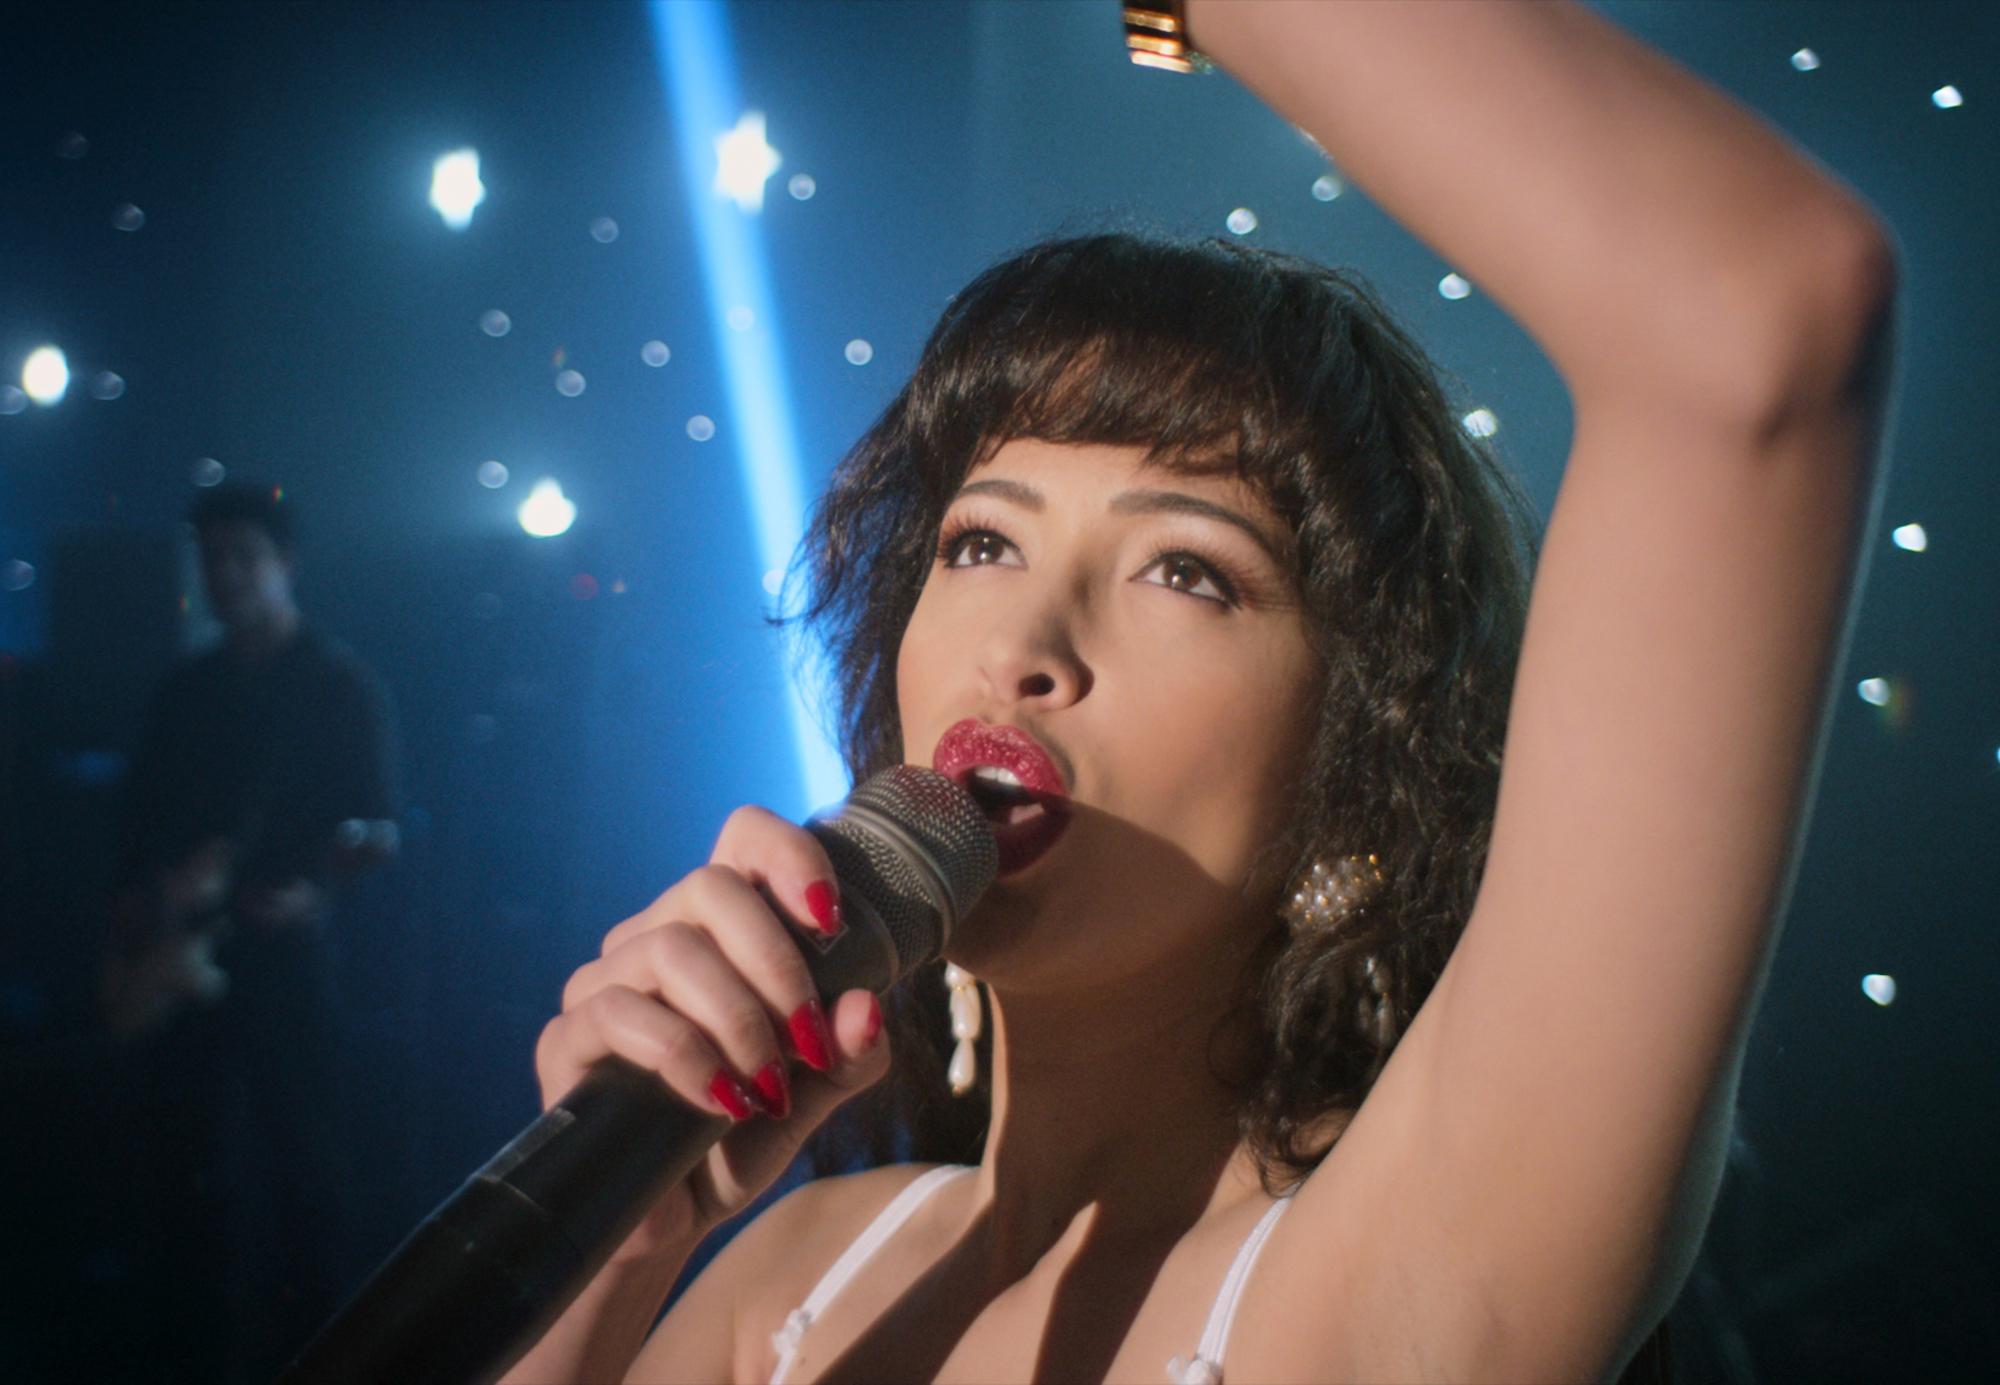 Christian Serratos as Selena Quintanilla in 'SELENA THE SERIES' on Netflix Dec. 4